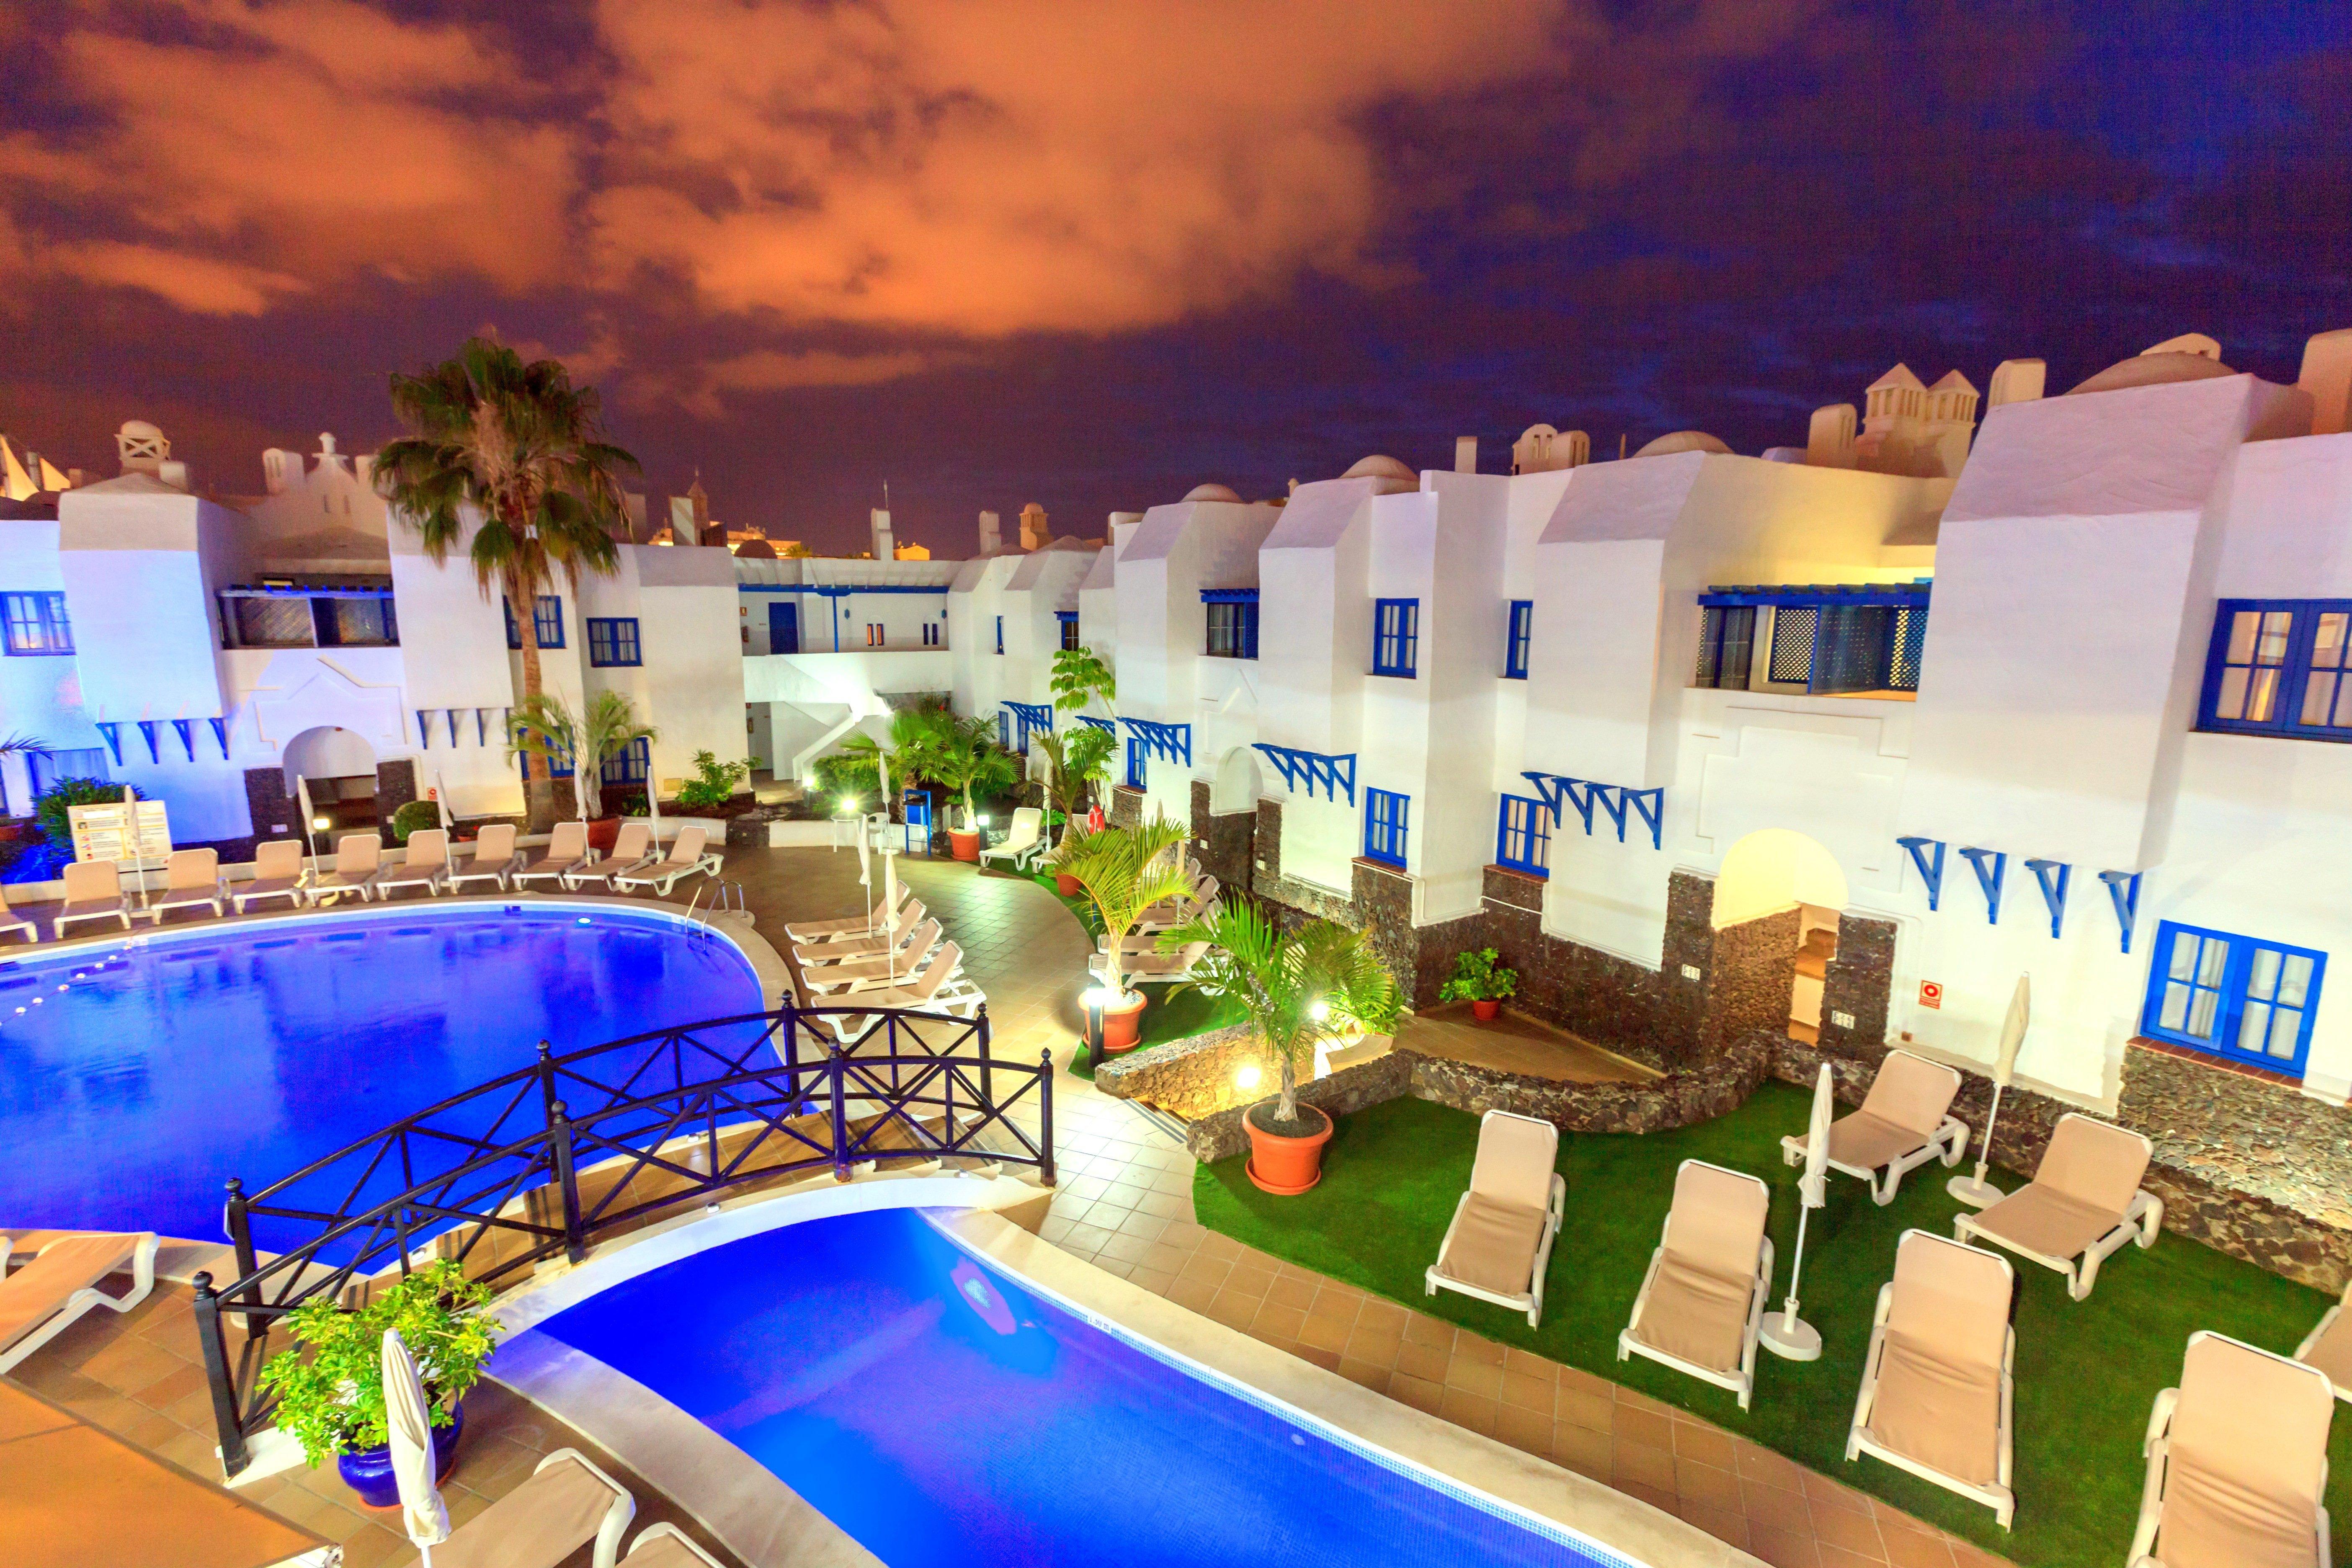 Villas In Costa Adeje